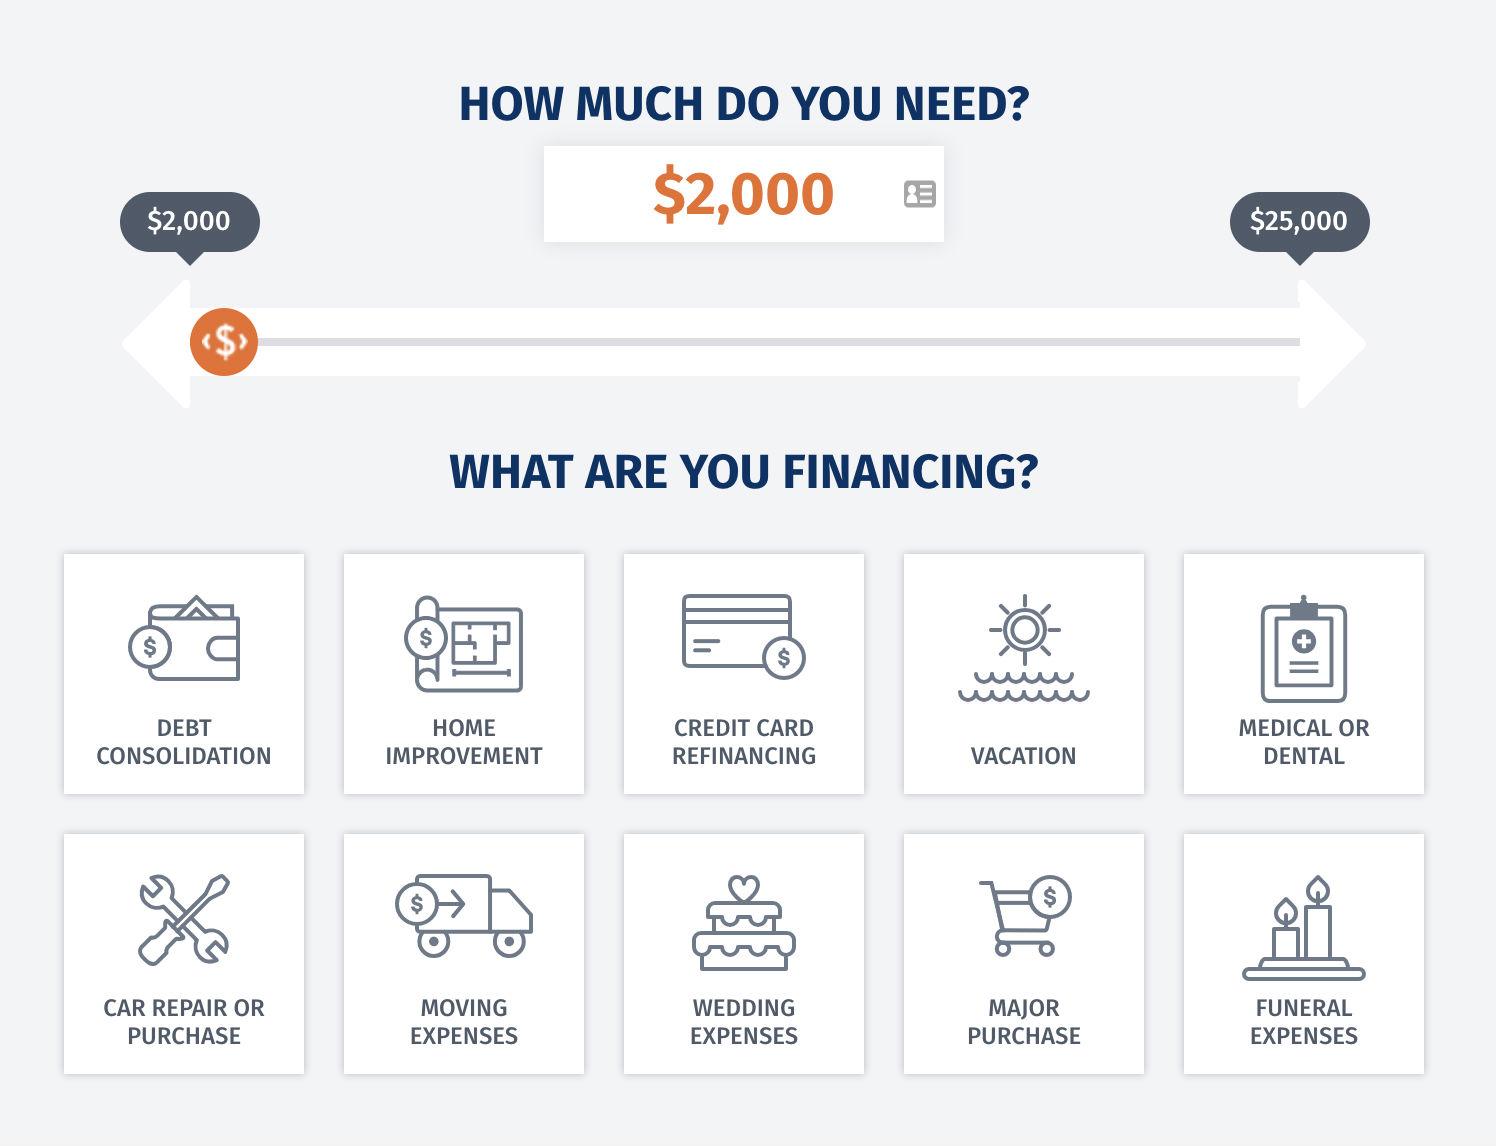 LendingPoint Financing Options